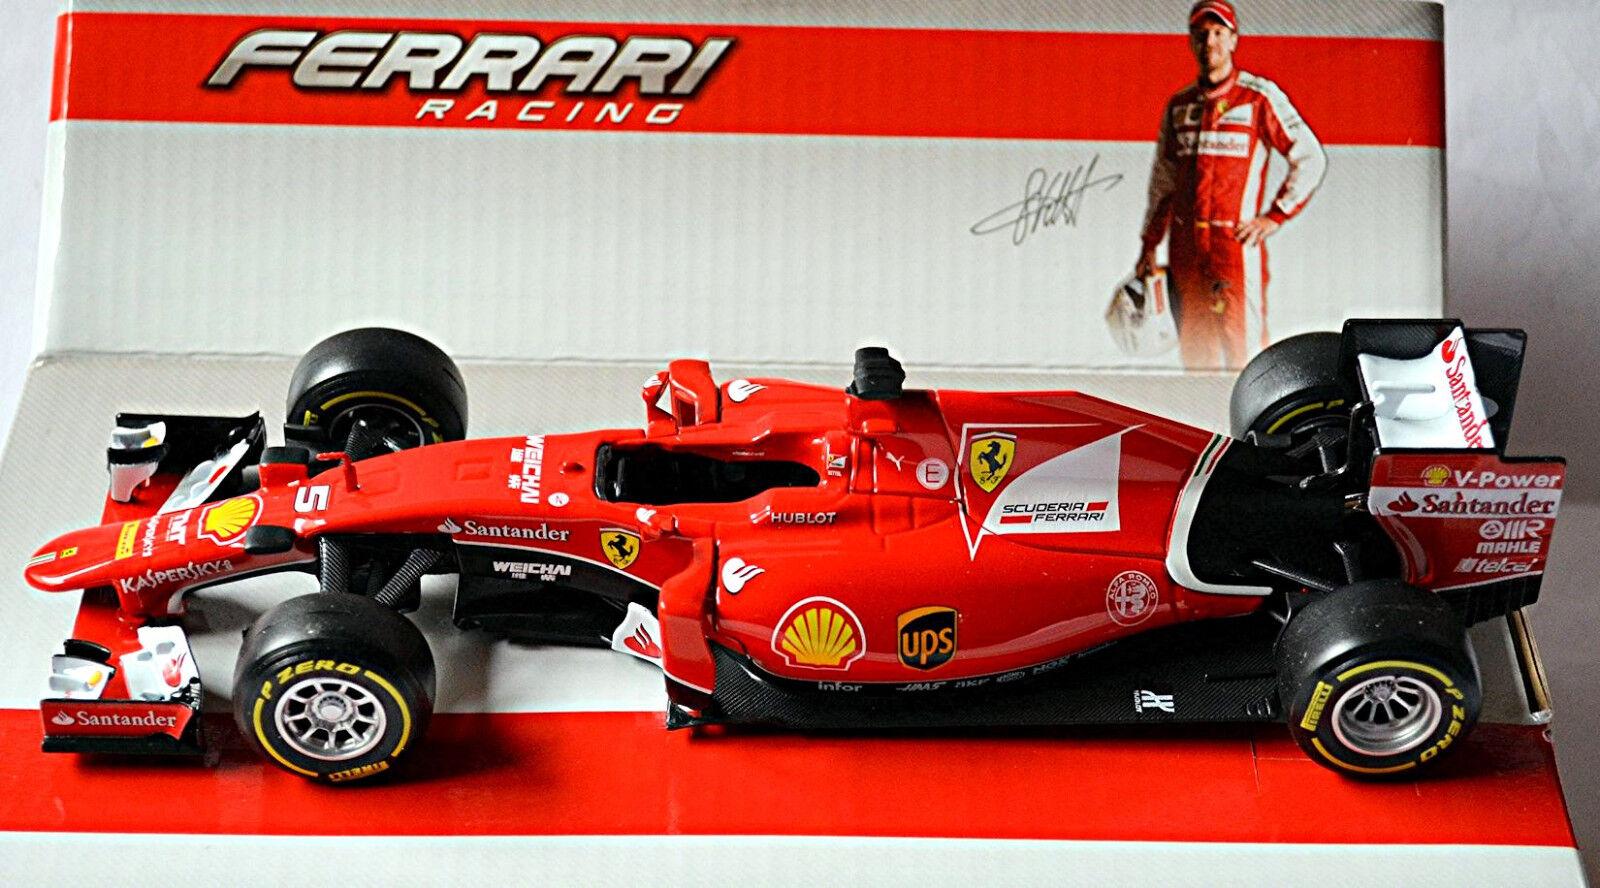 Ferrari Sf15-t F1 Sebastian Vettel 2015 Red Red 1 24 Bburago